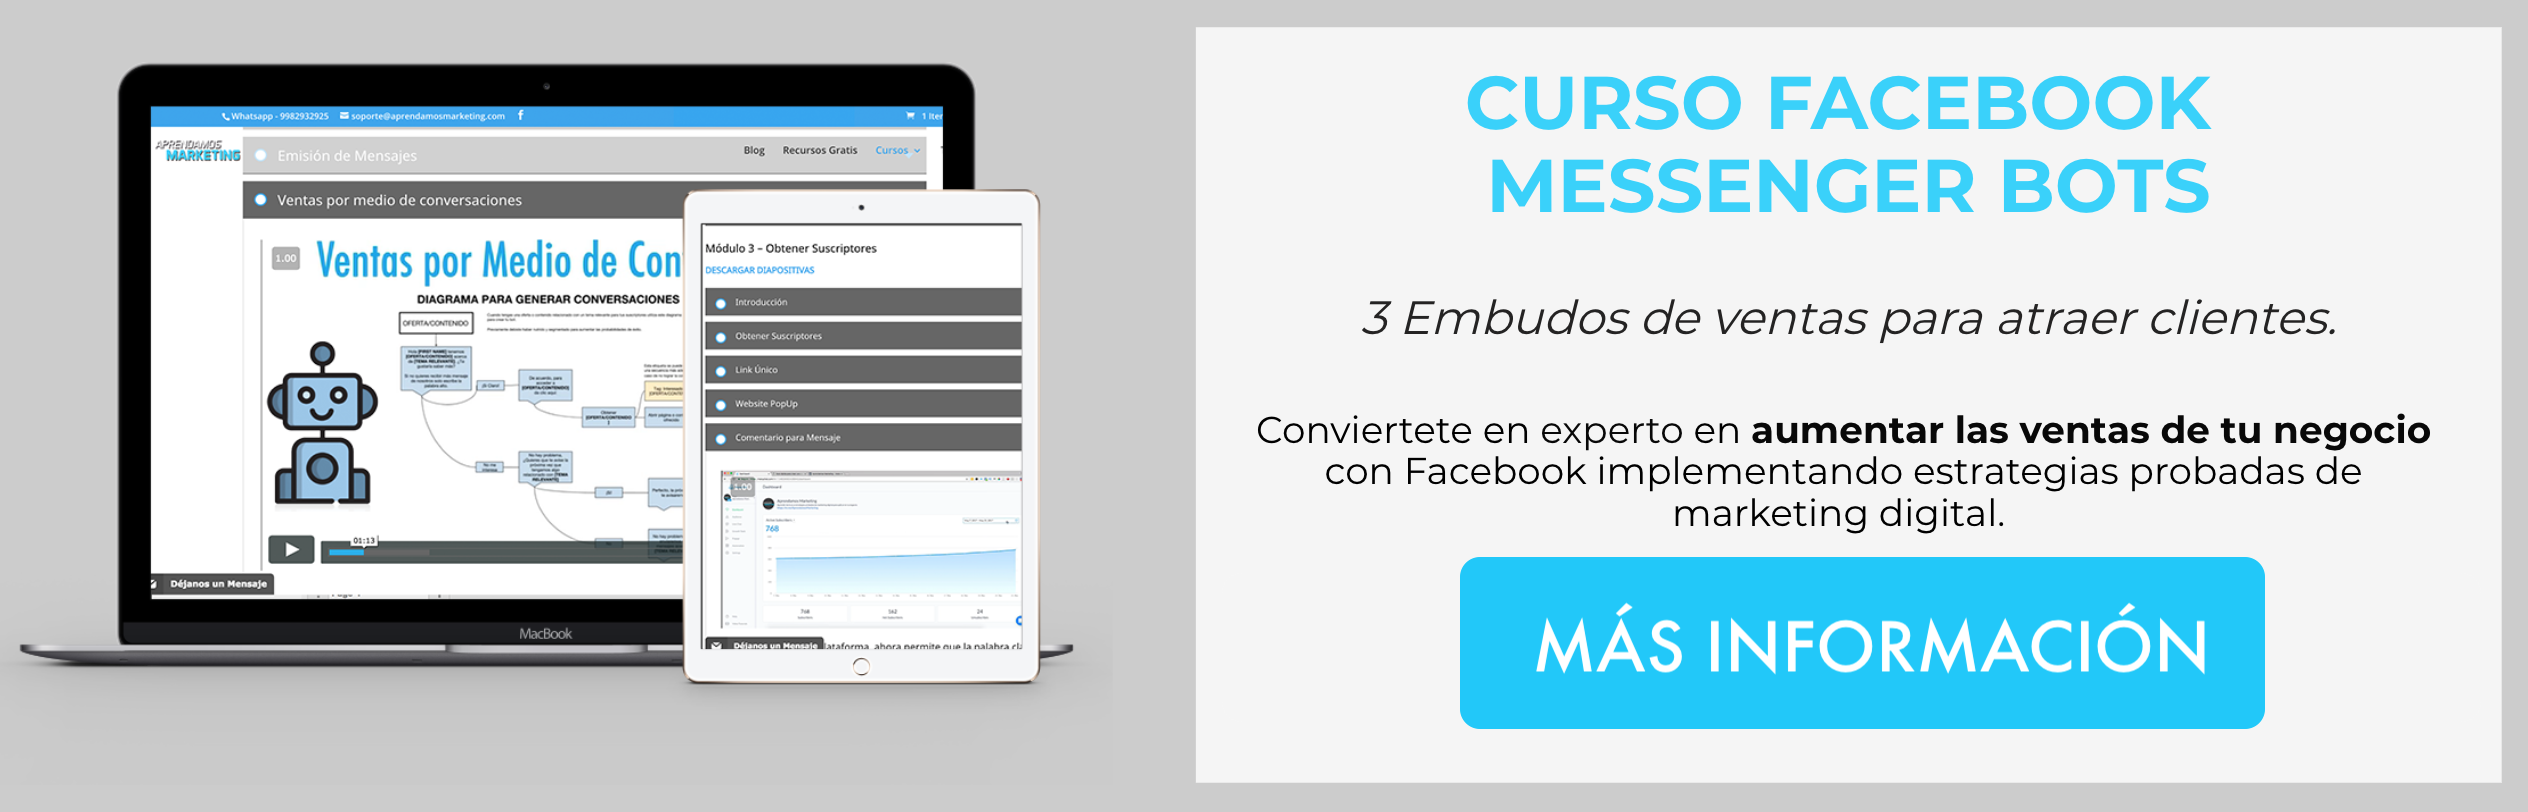 CTA-Blog-Curso Facebook Messenger Bots